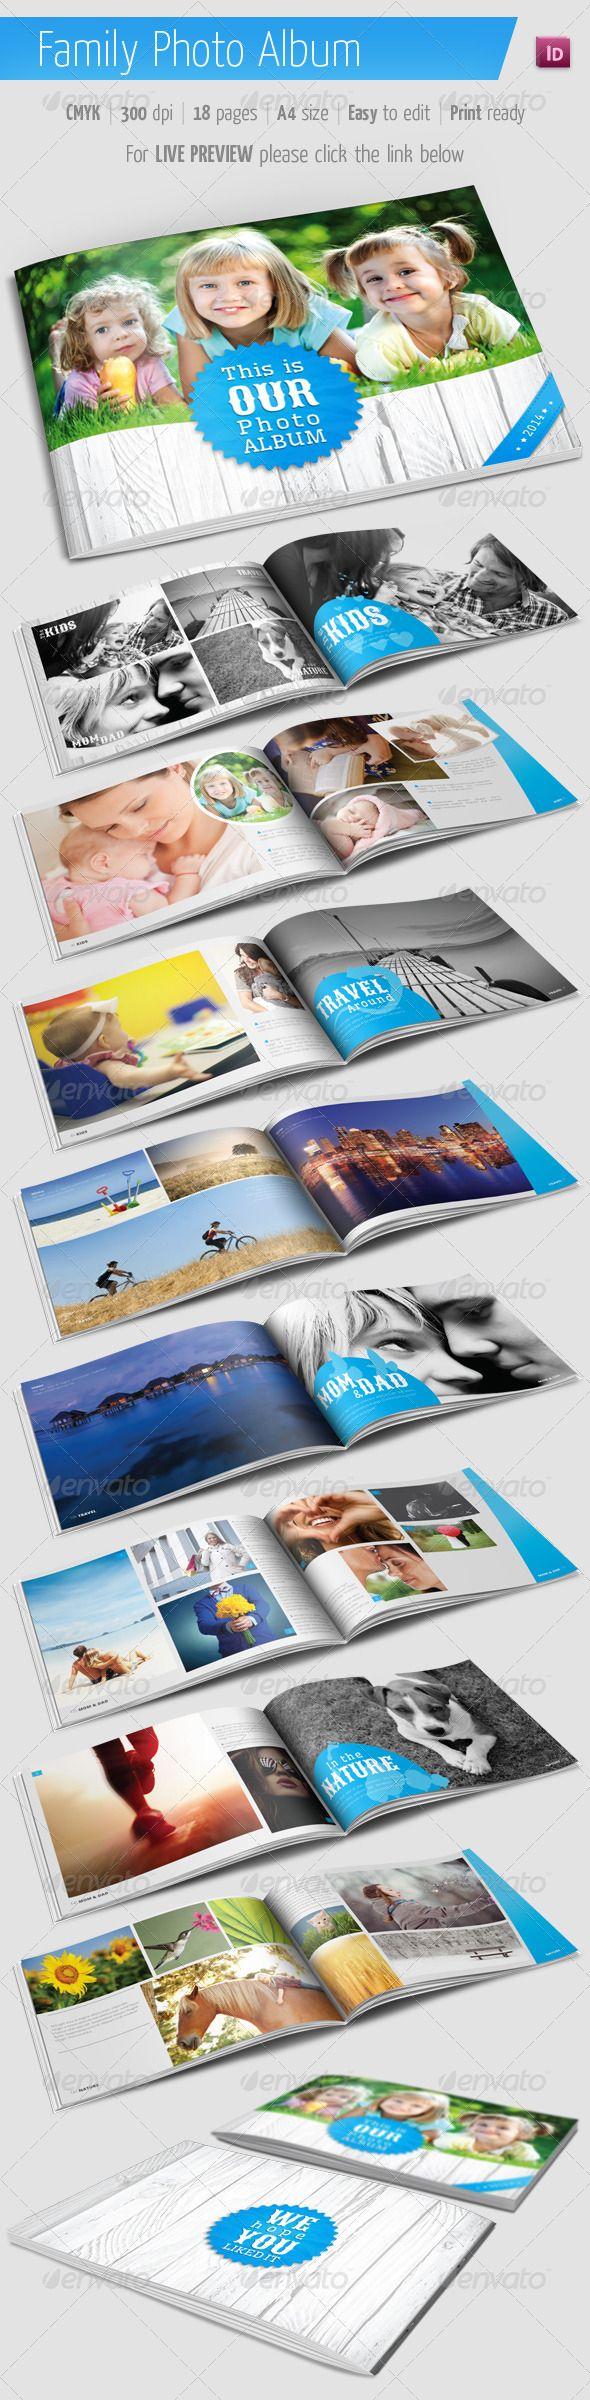 Family Photo Album for Indesign - Photo Albums Print Templates ...